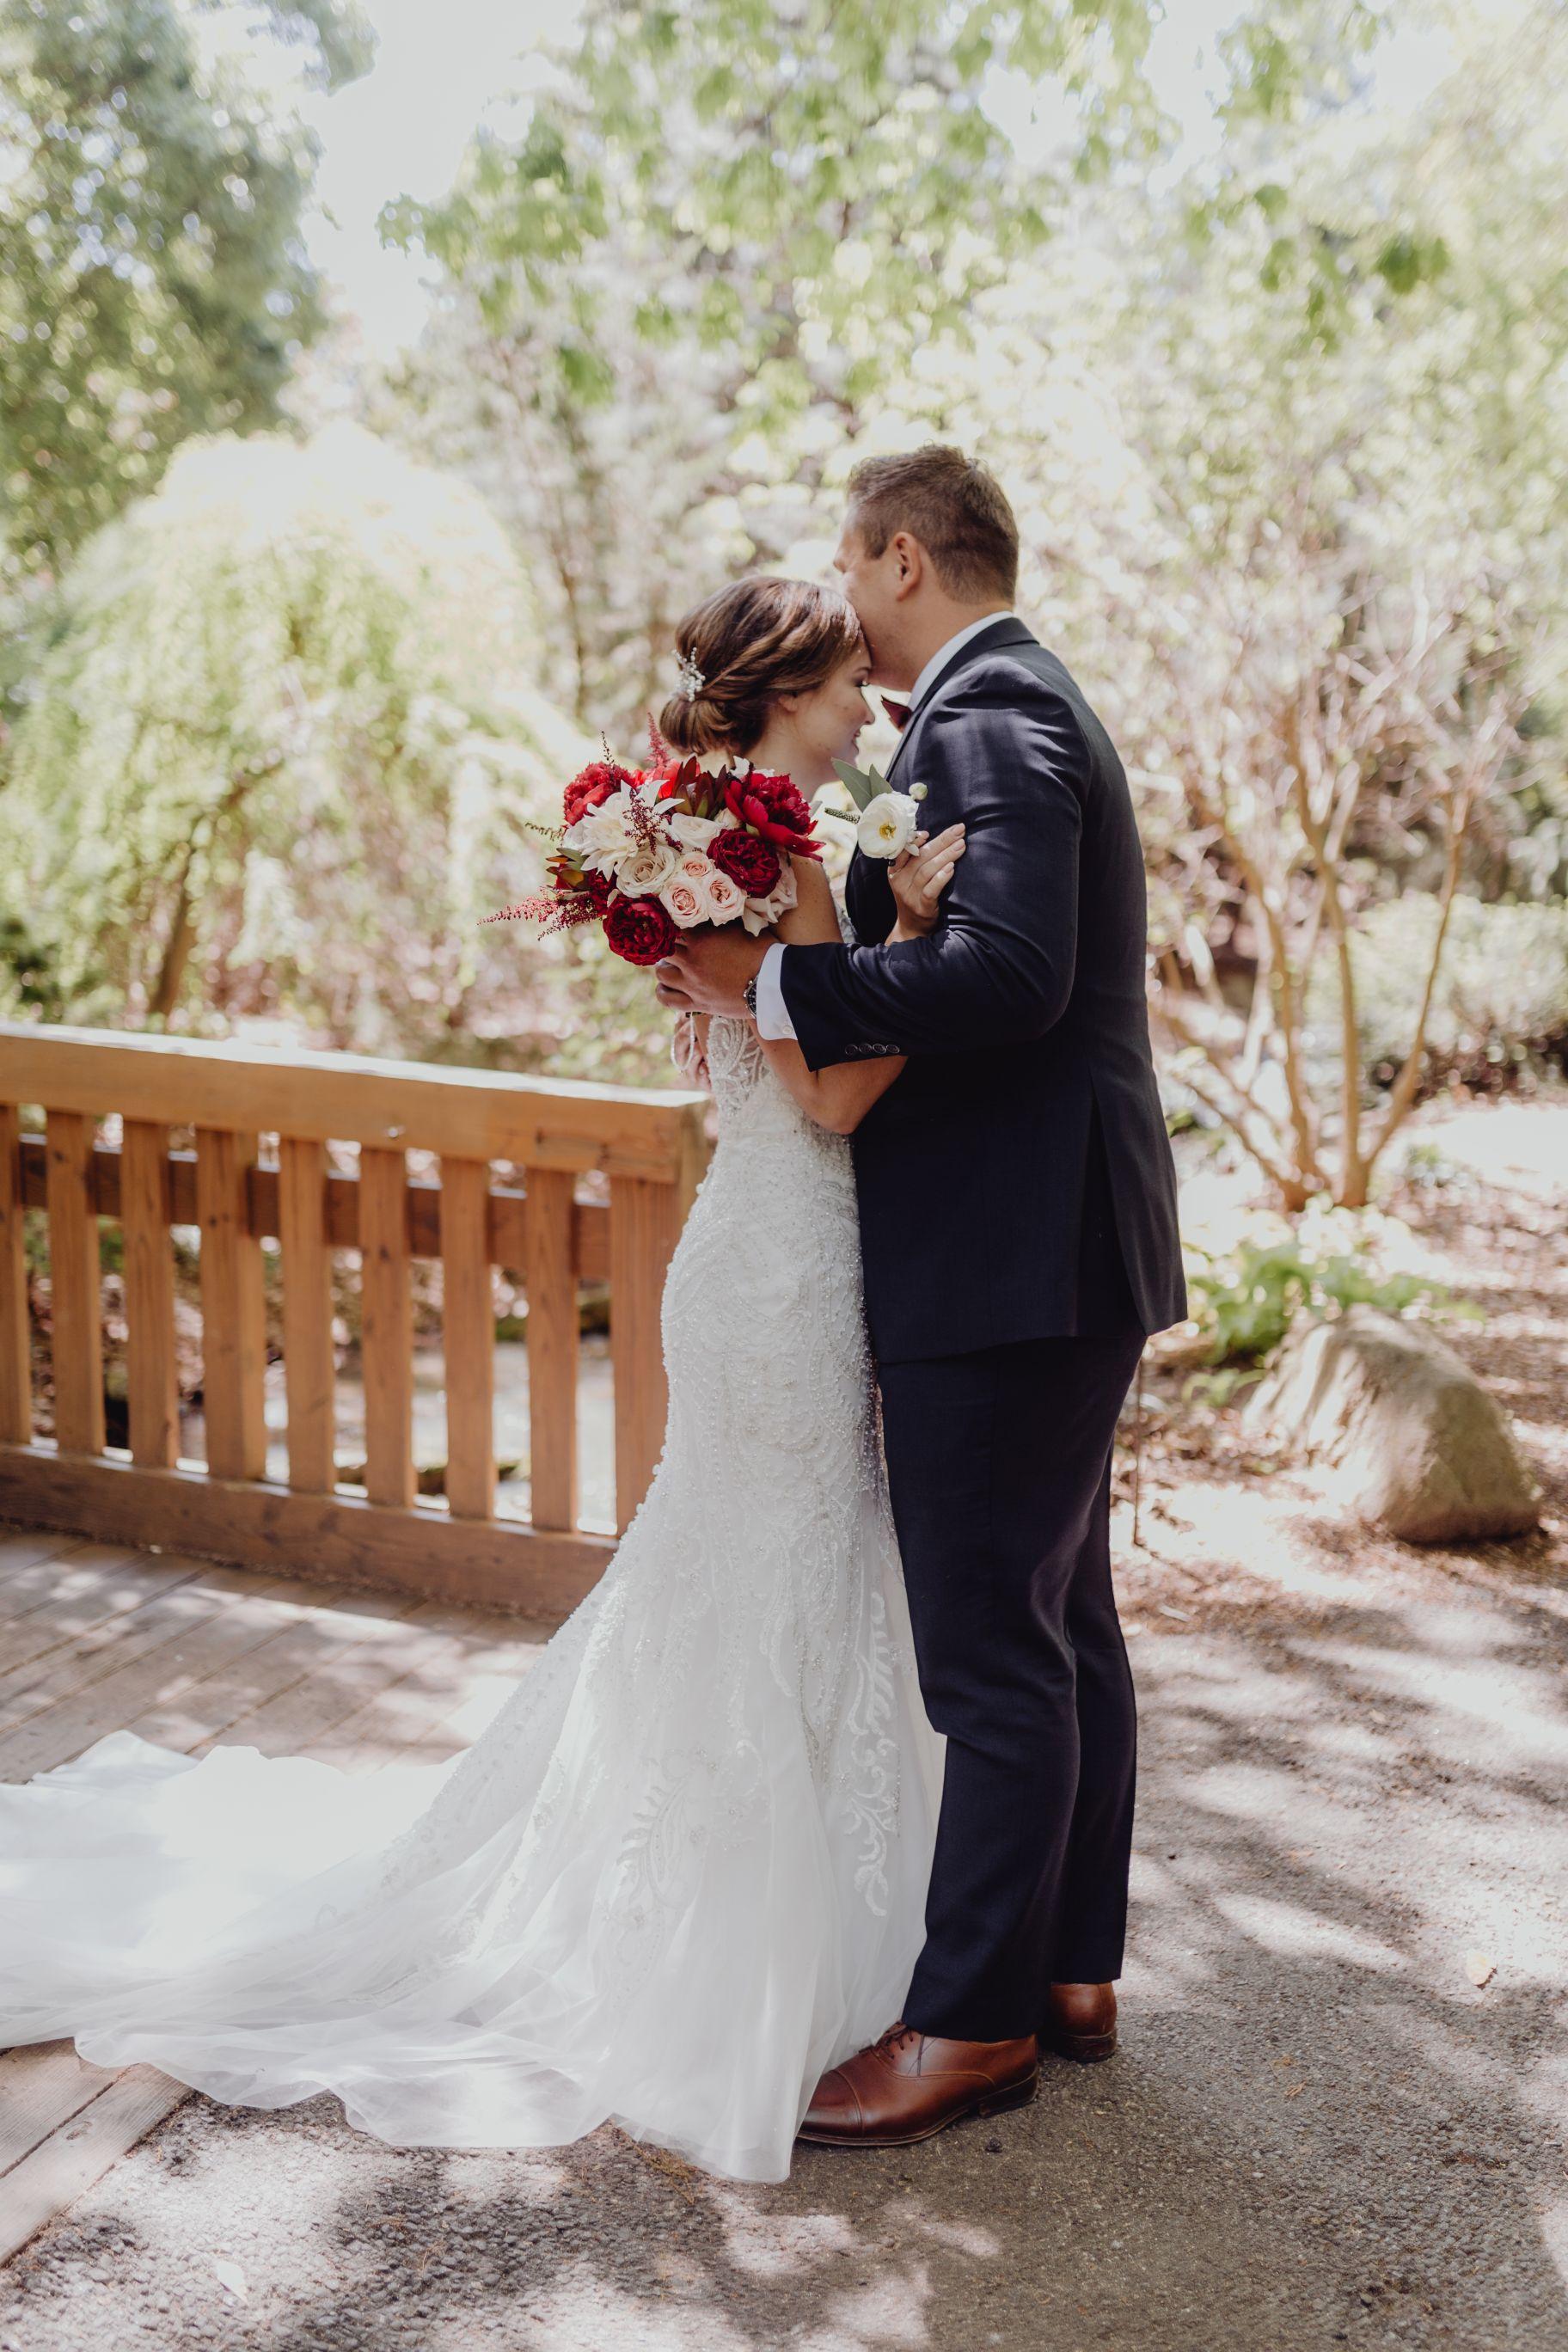 North-Dallas-Wedding-Florist-David-Co.-3.jpg